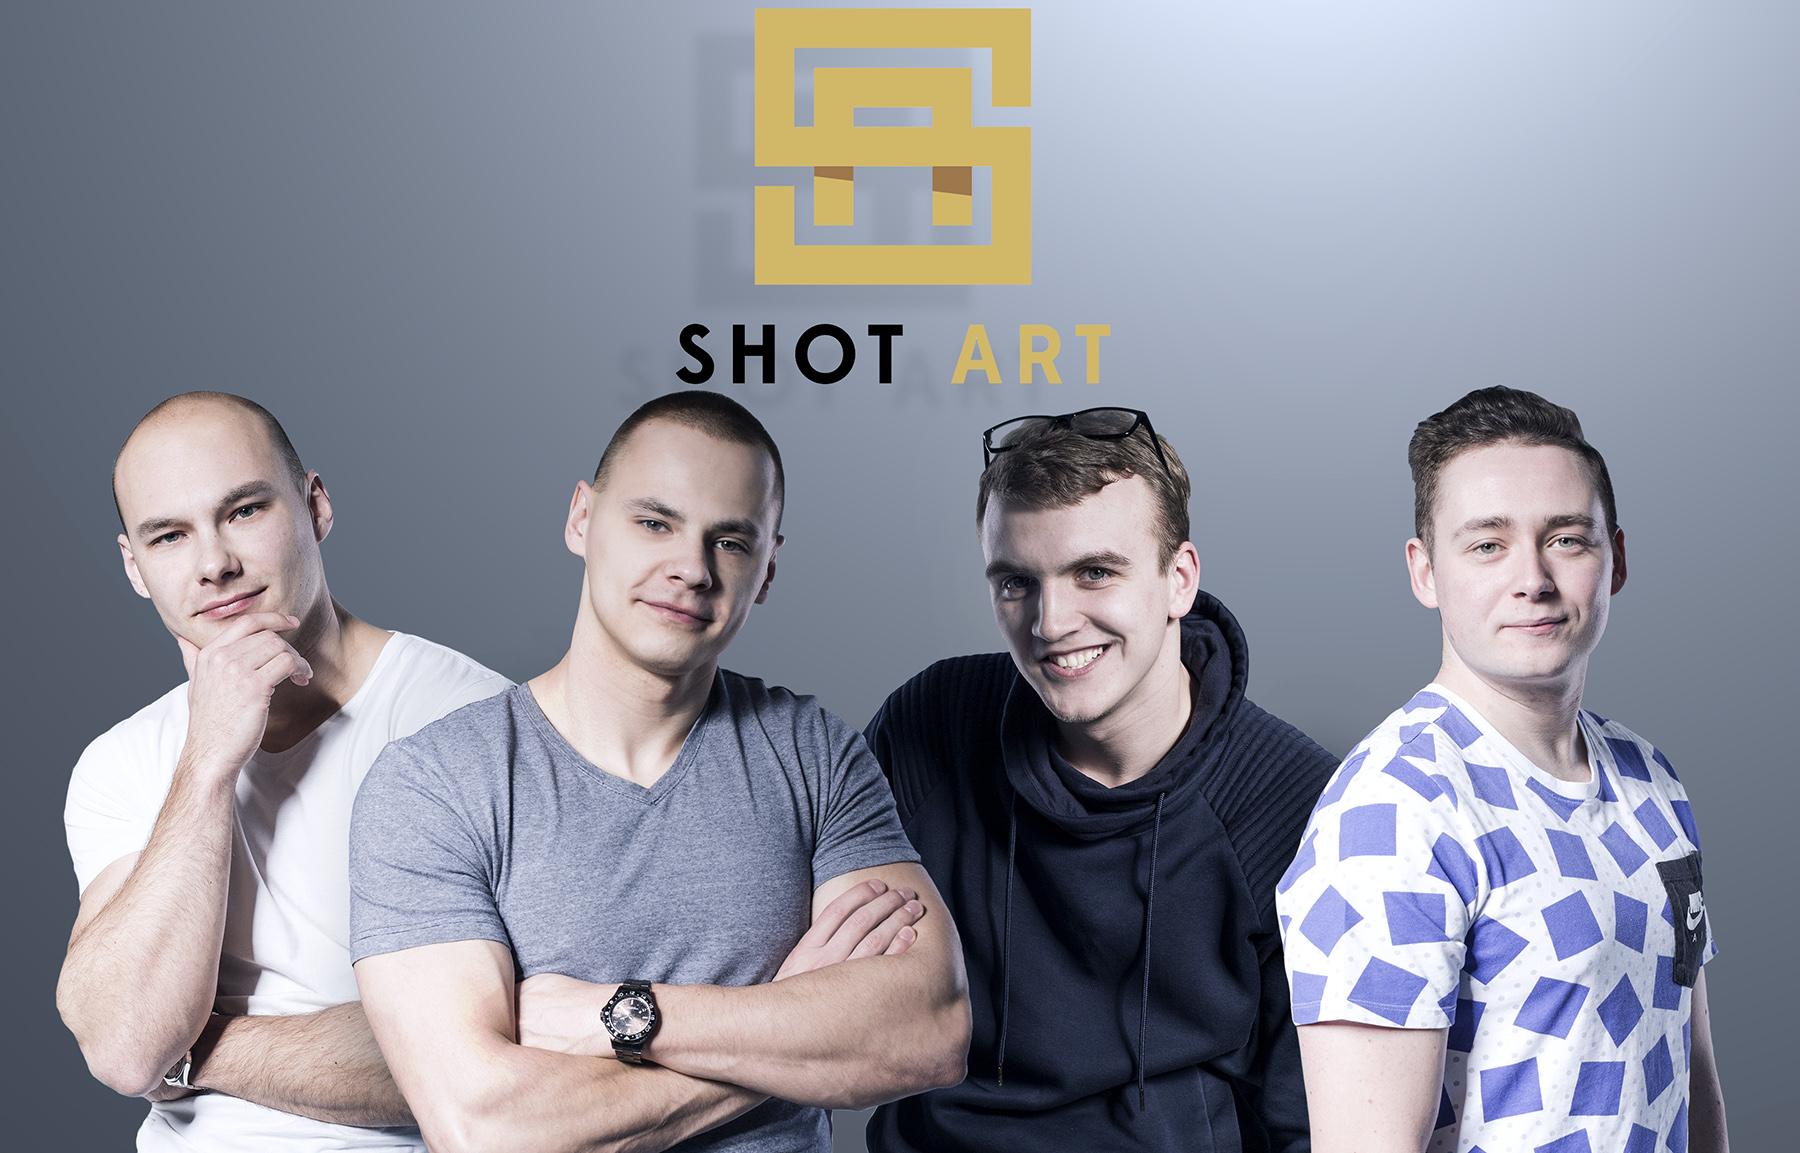 ShotArt team Shot art team zdjęcie biznesowe